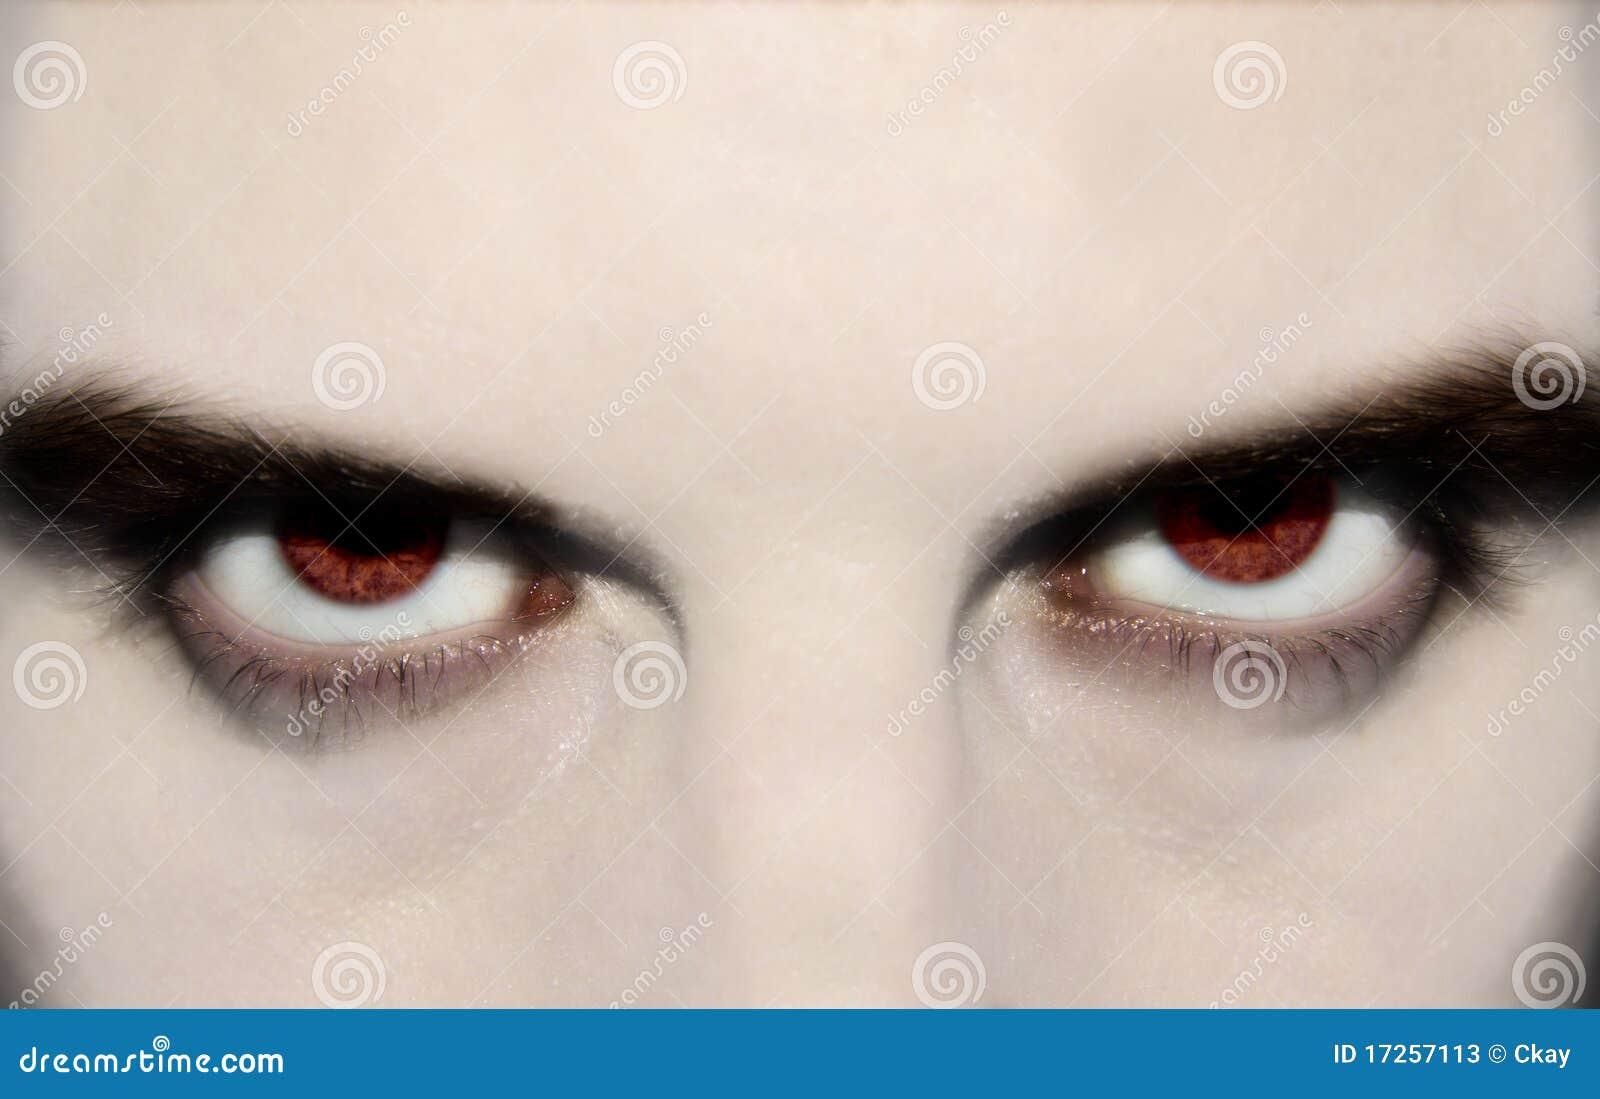 Evil Eyes Looking Up Wiring Diagrams Bat Detectorschematicpng Vampire Watching Stock Image Of Devil Diabolic 17257113 Rh Dreamstime Com Anime Demon Red